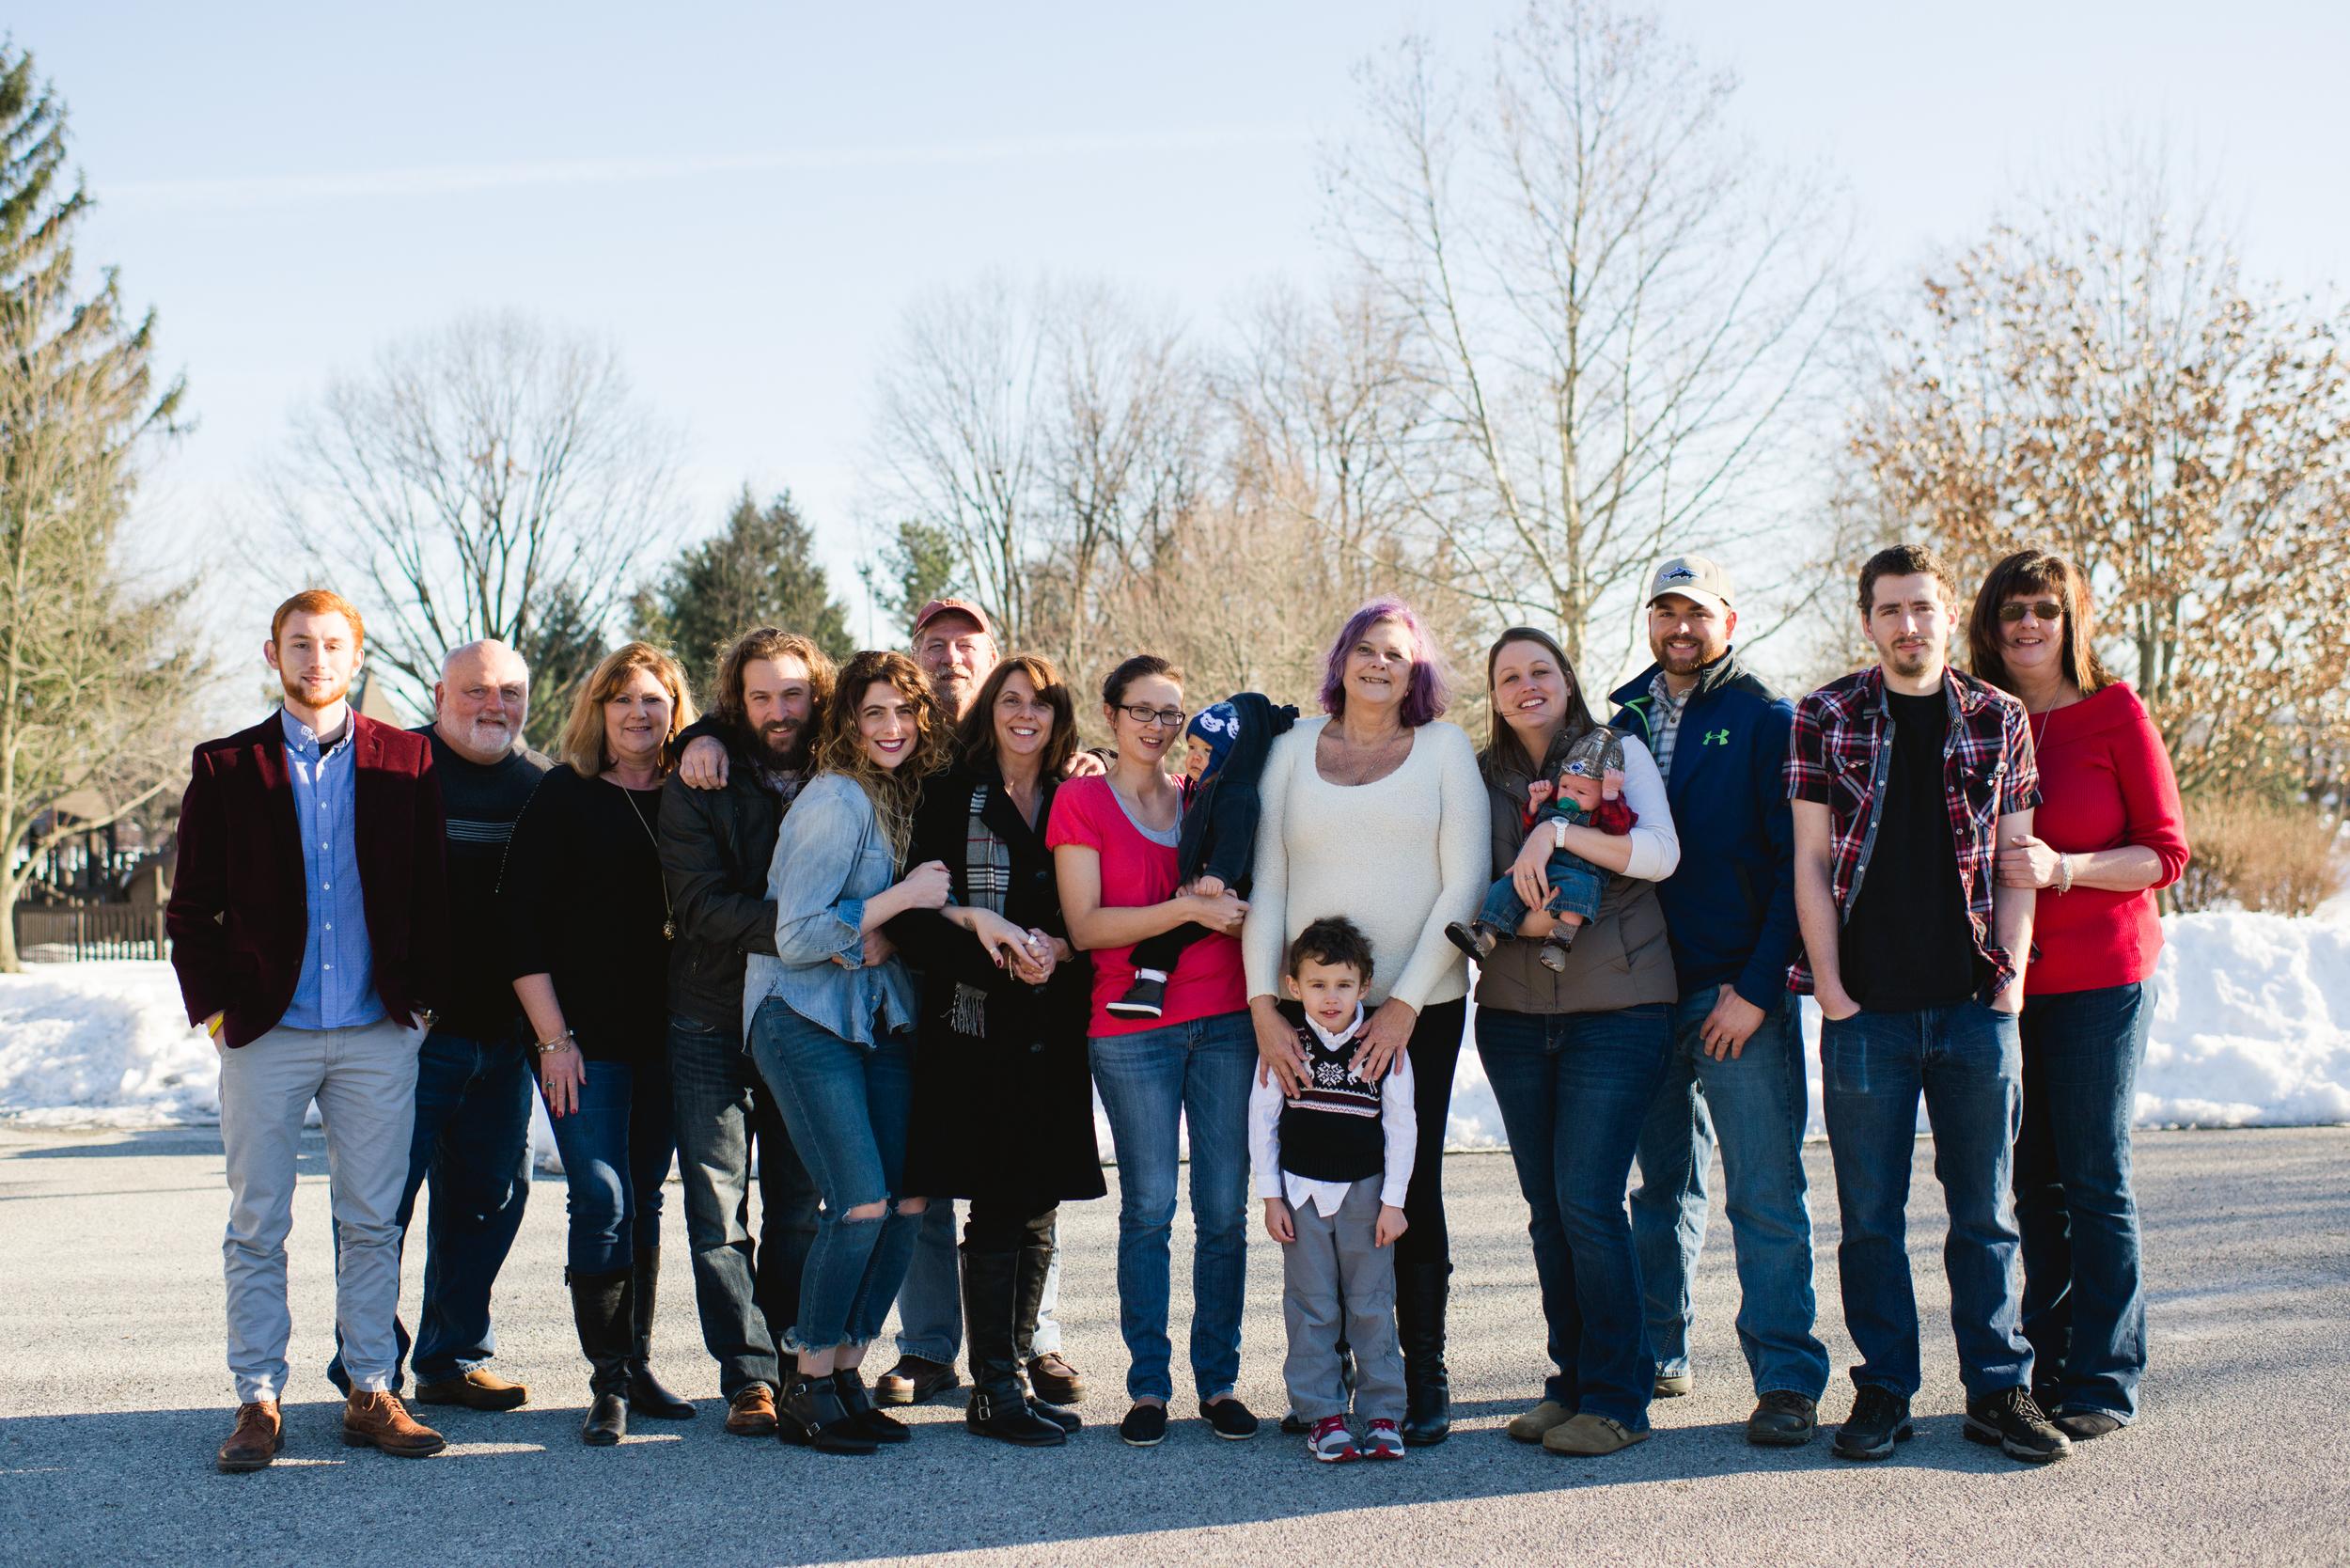 Wavy Alabaster x Family Ties